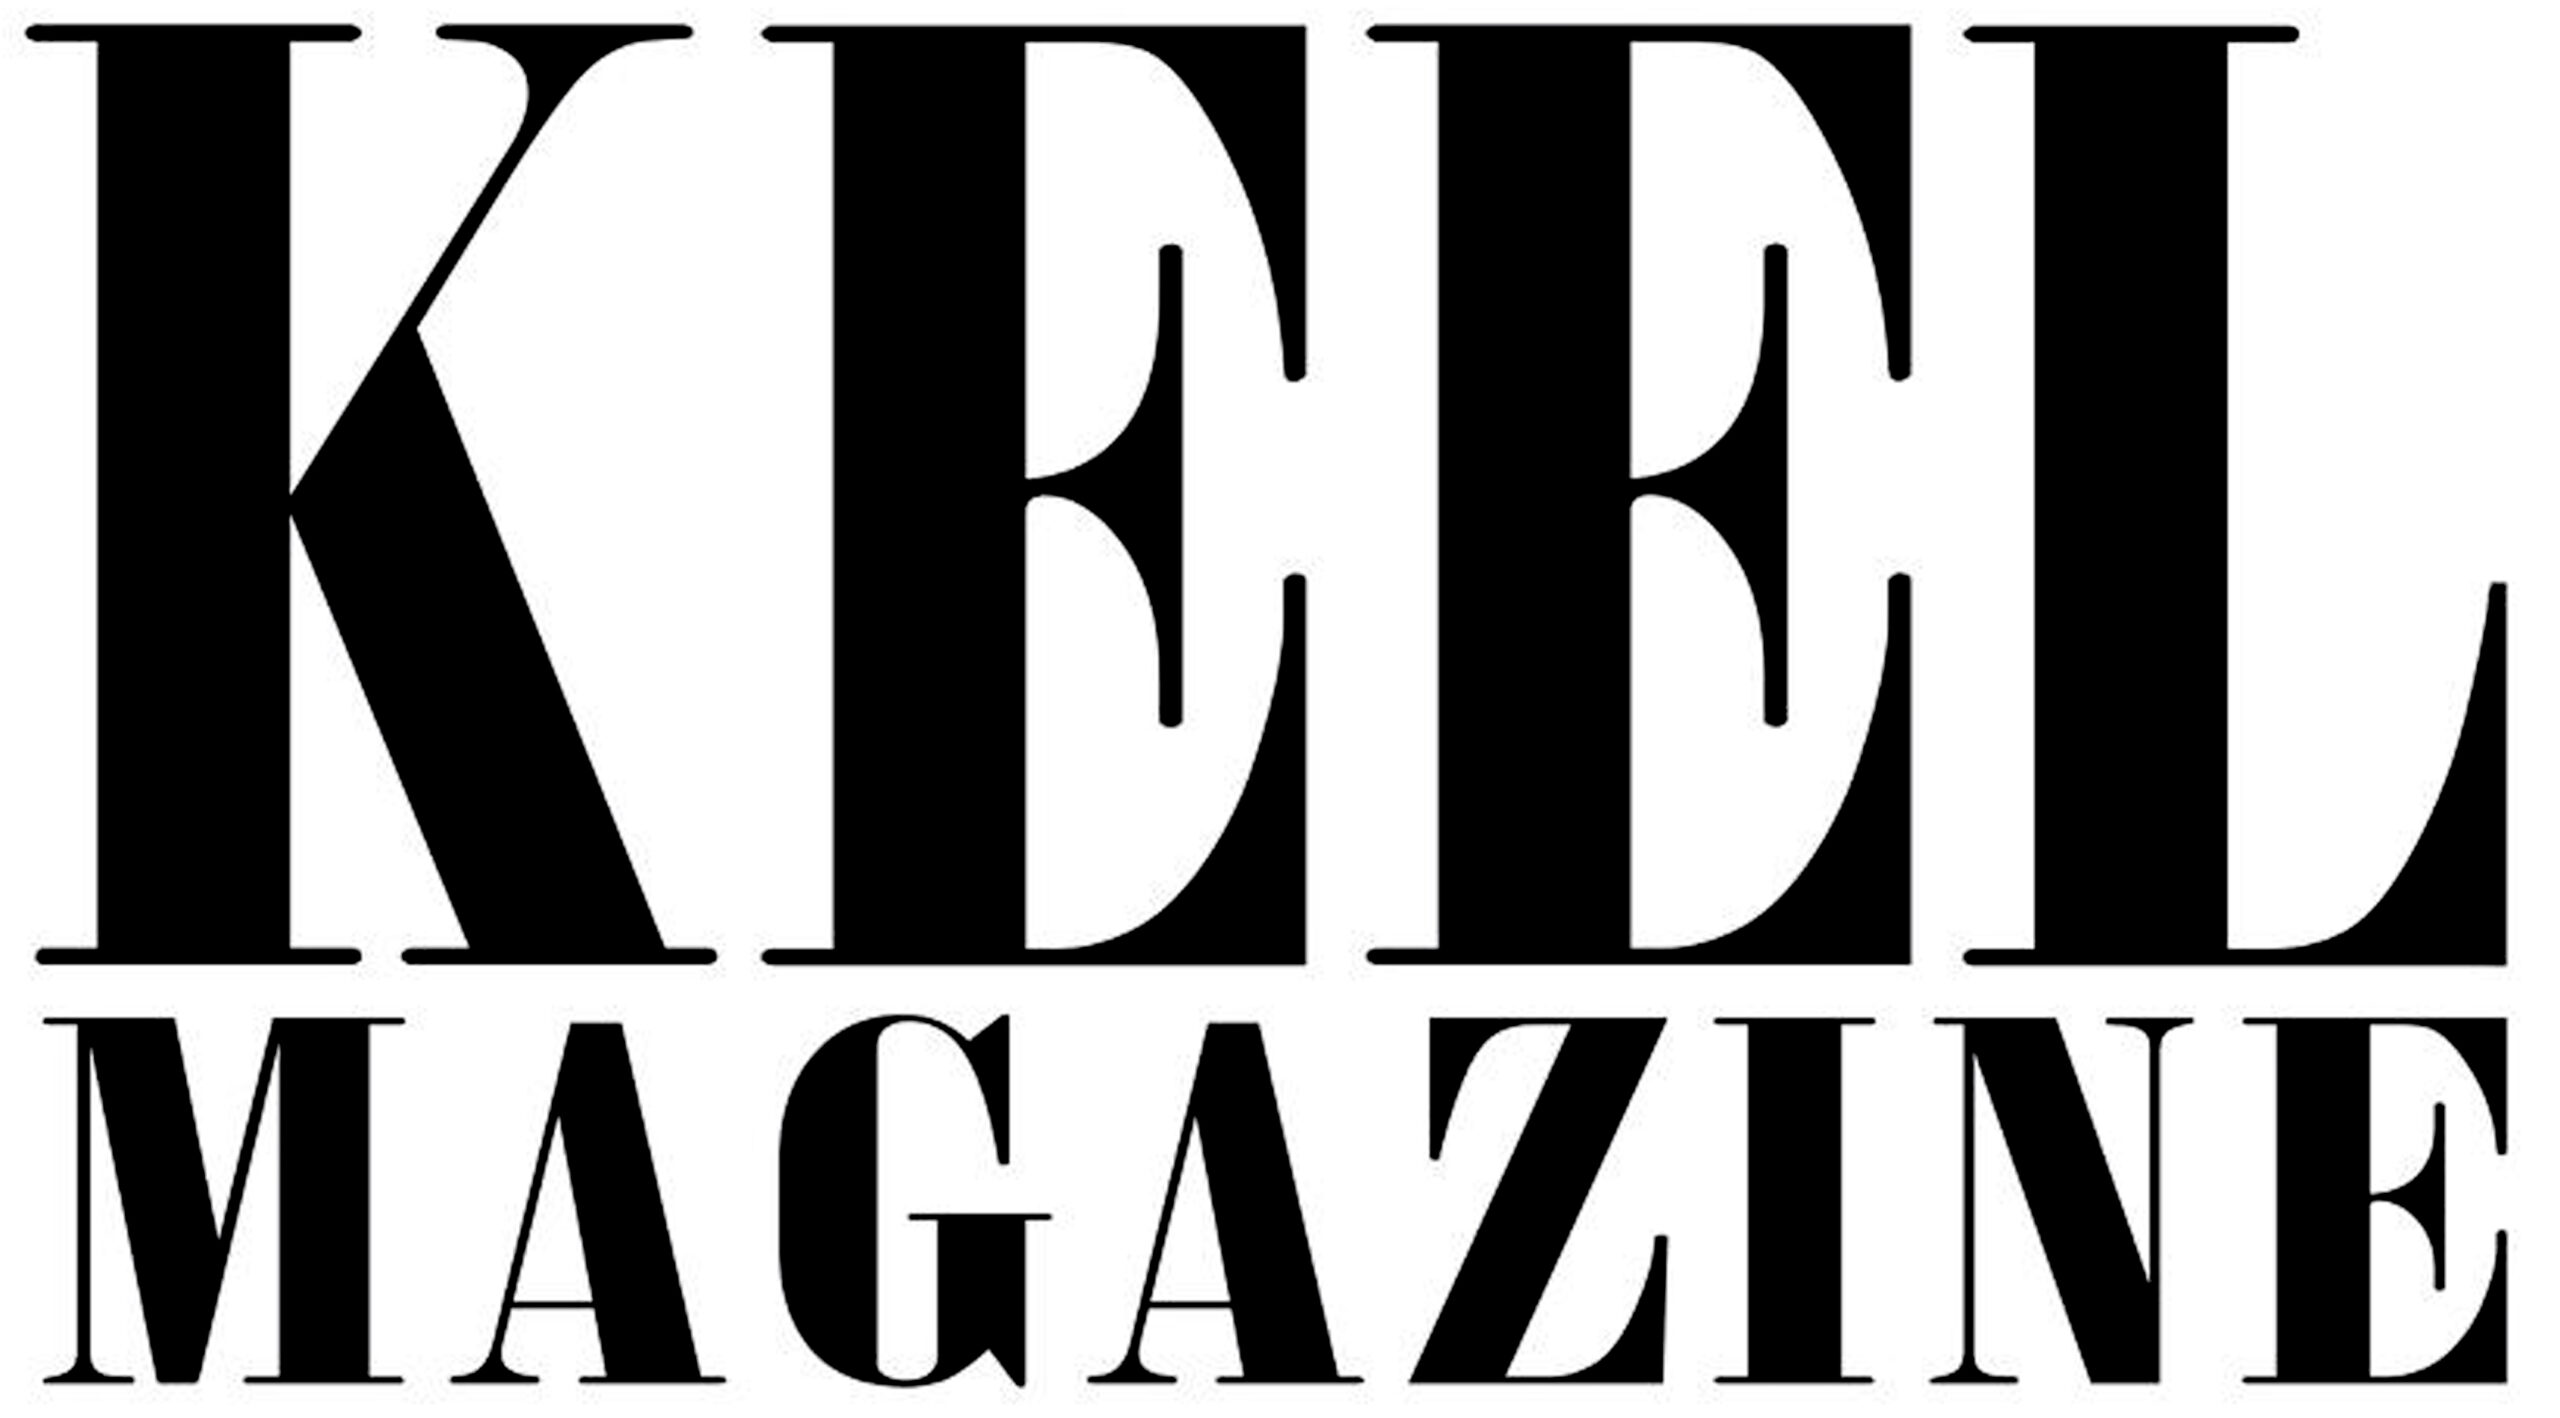 KEEL MAGAZINE – Fashion & Beauty from around the world